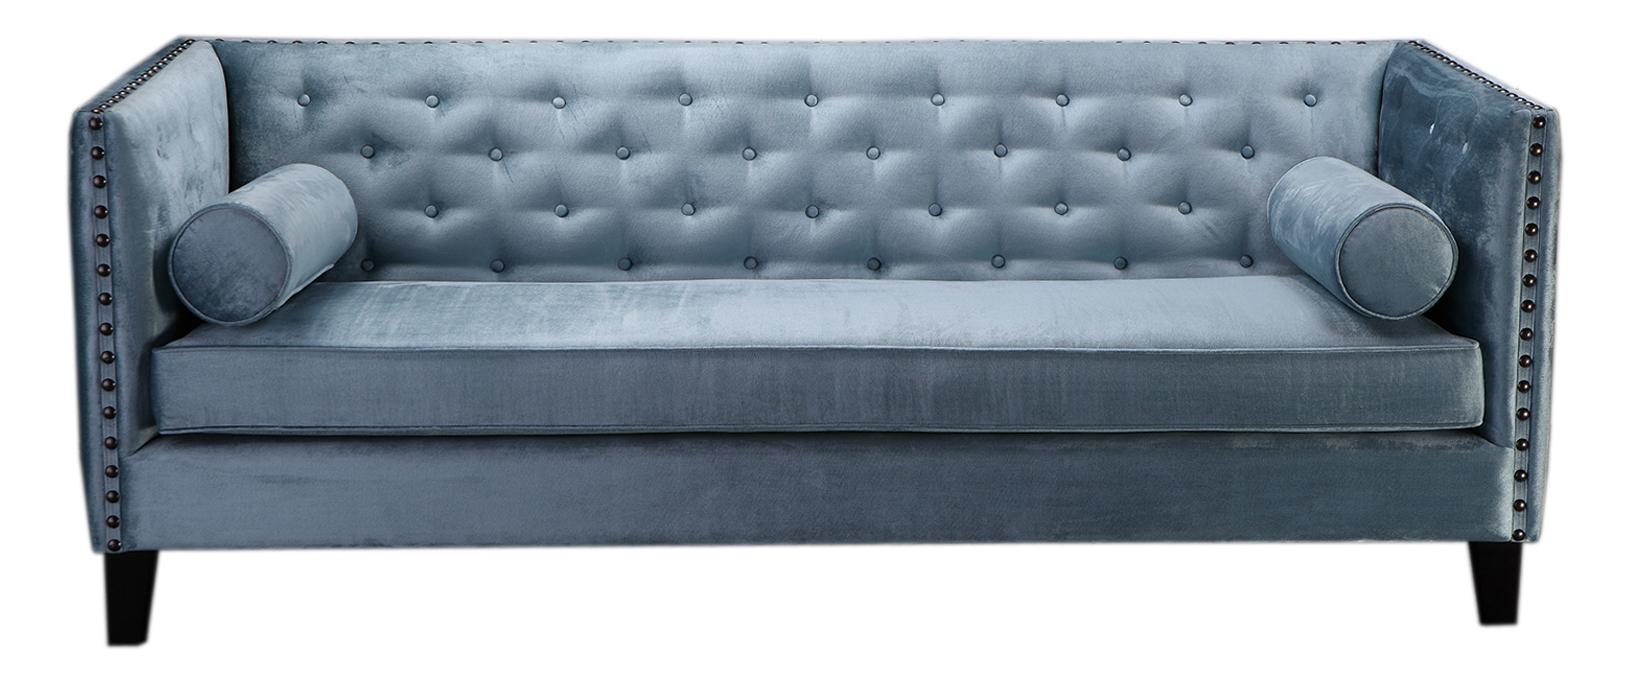 sofa 3 sitzer bezug aus stoff grau blau mit 2 kissenrollen b215 x t80 x h80 cm sofas. Black Bedroom Furniture Sets. Home Design Ideas